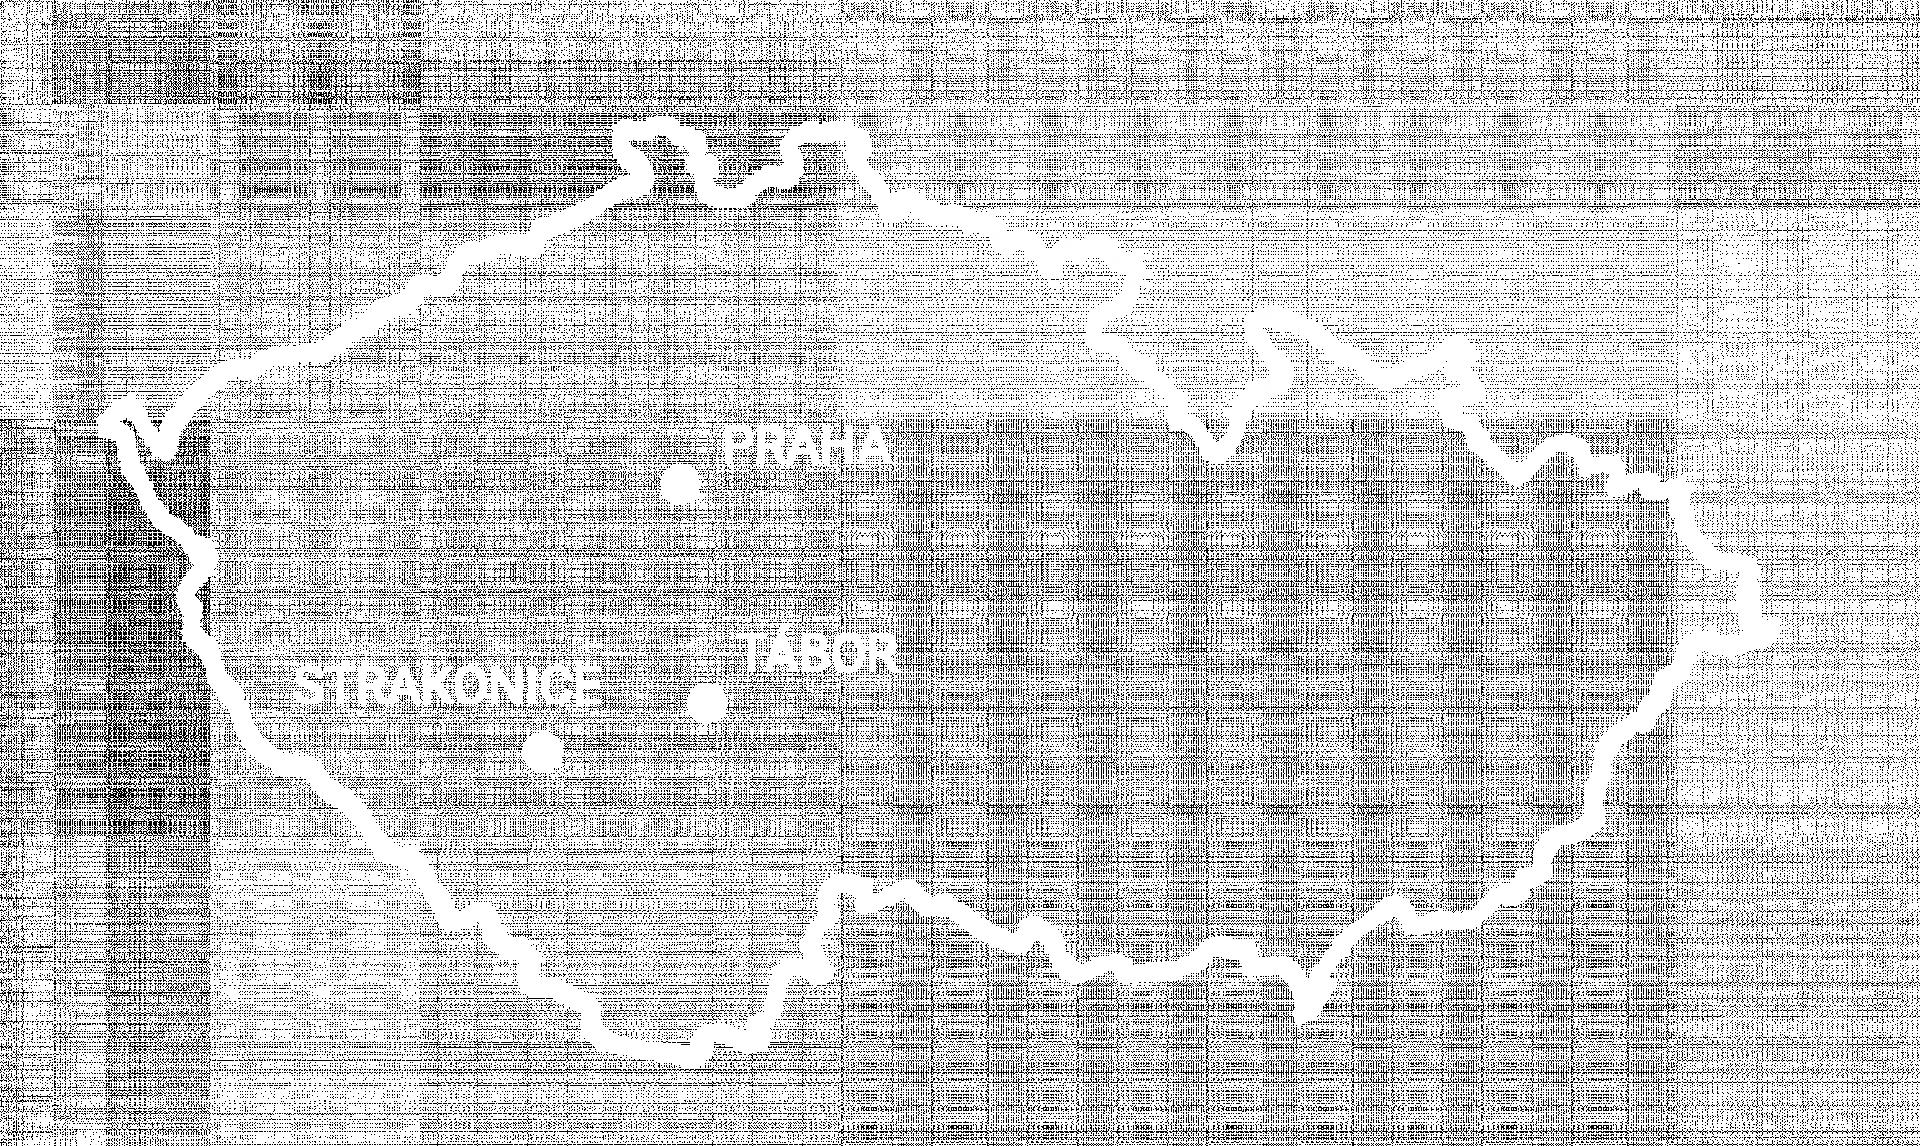 vas_mapa.png